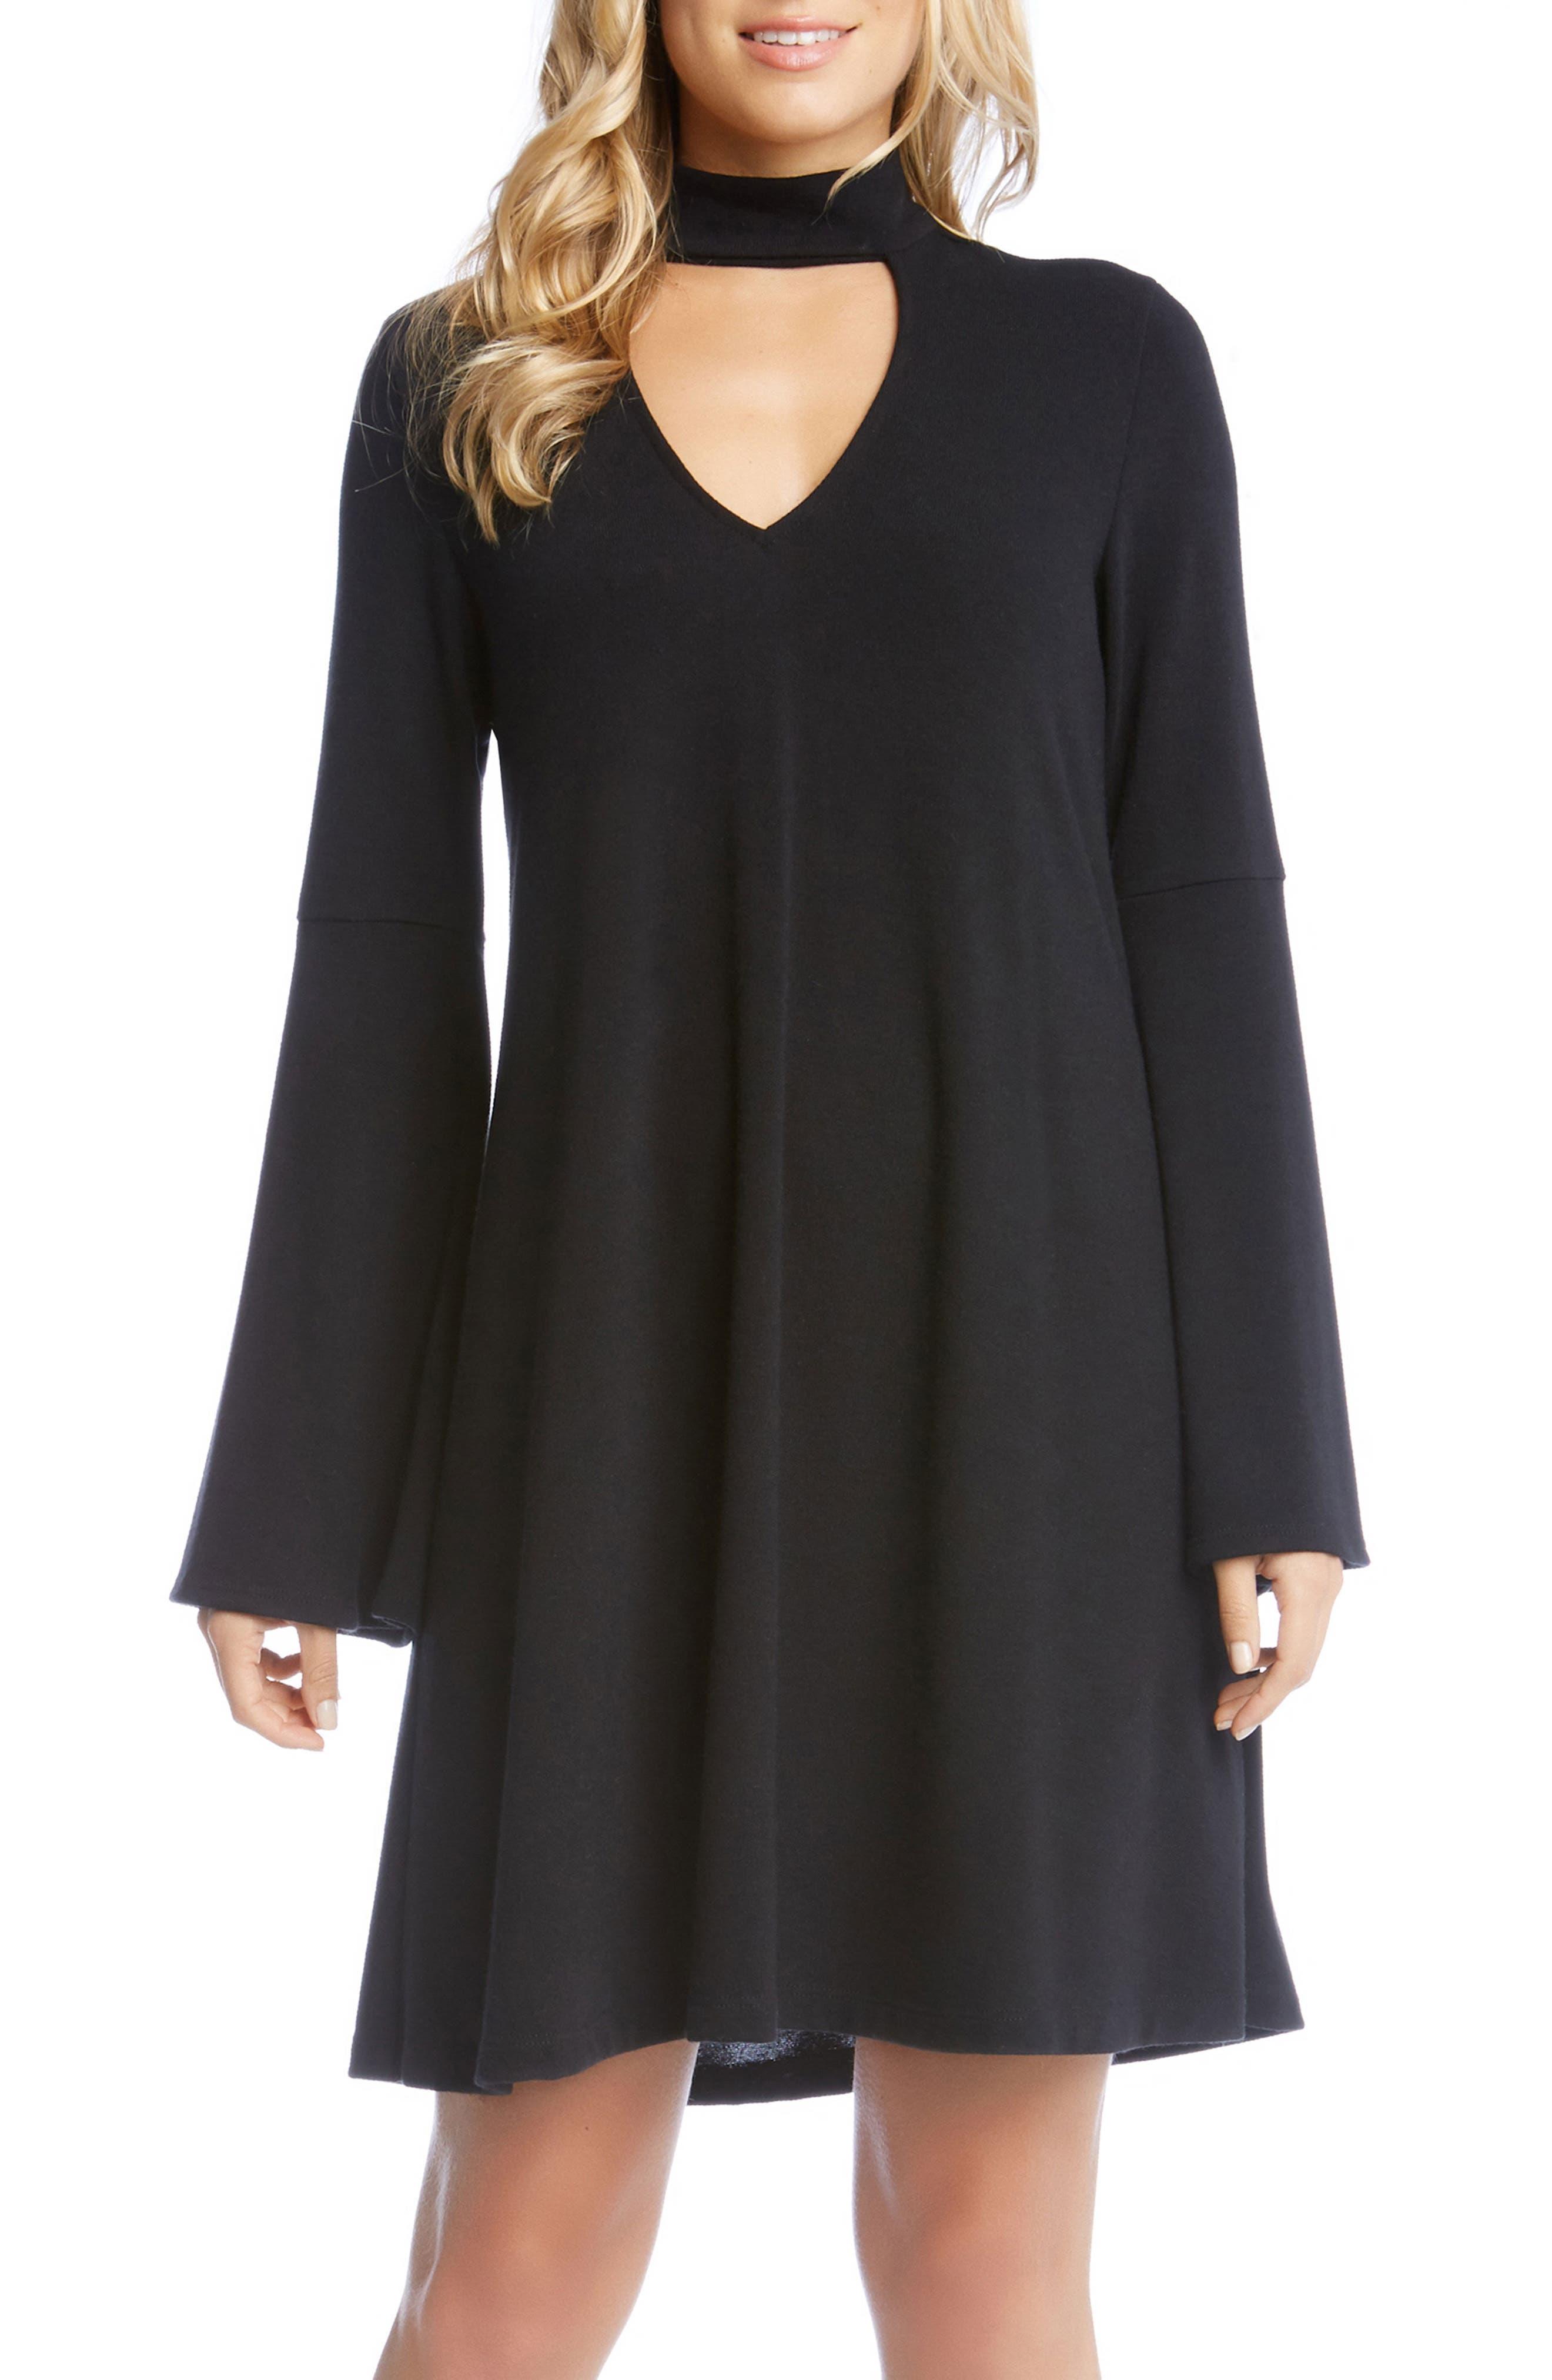 Taylor Choker Neck Dress,                             Main thumbnail 1, color,                             001